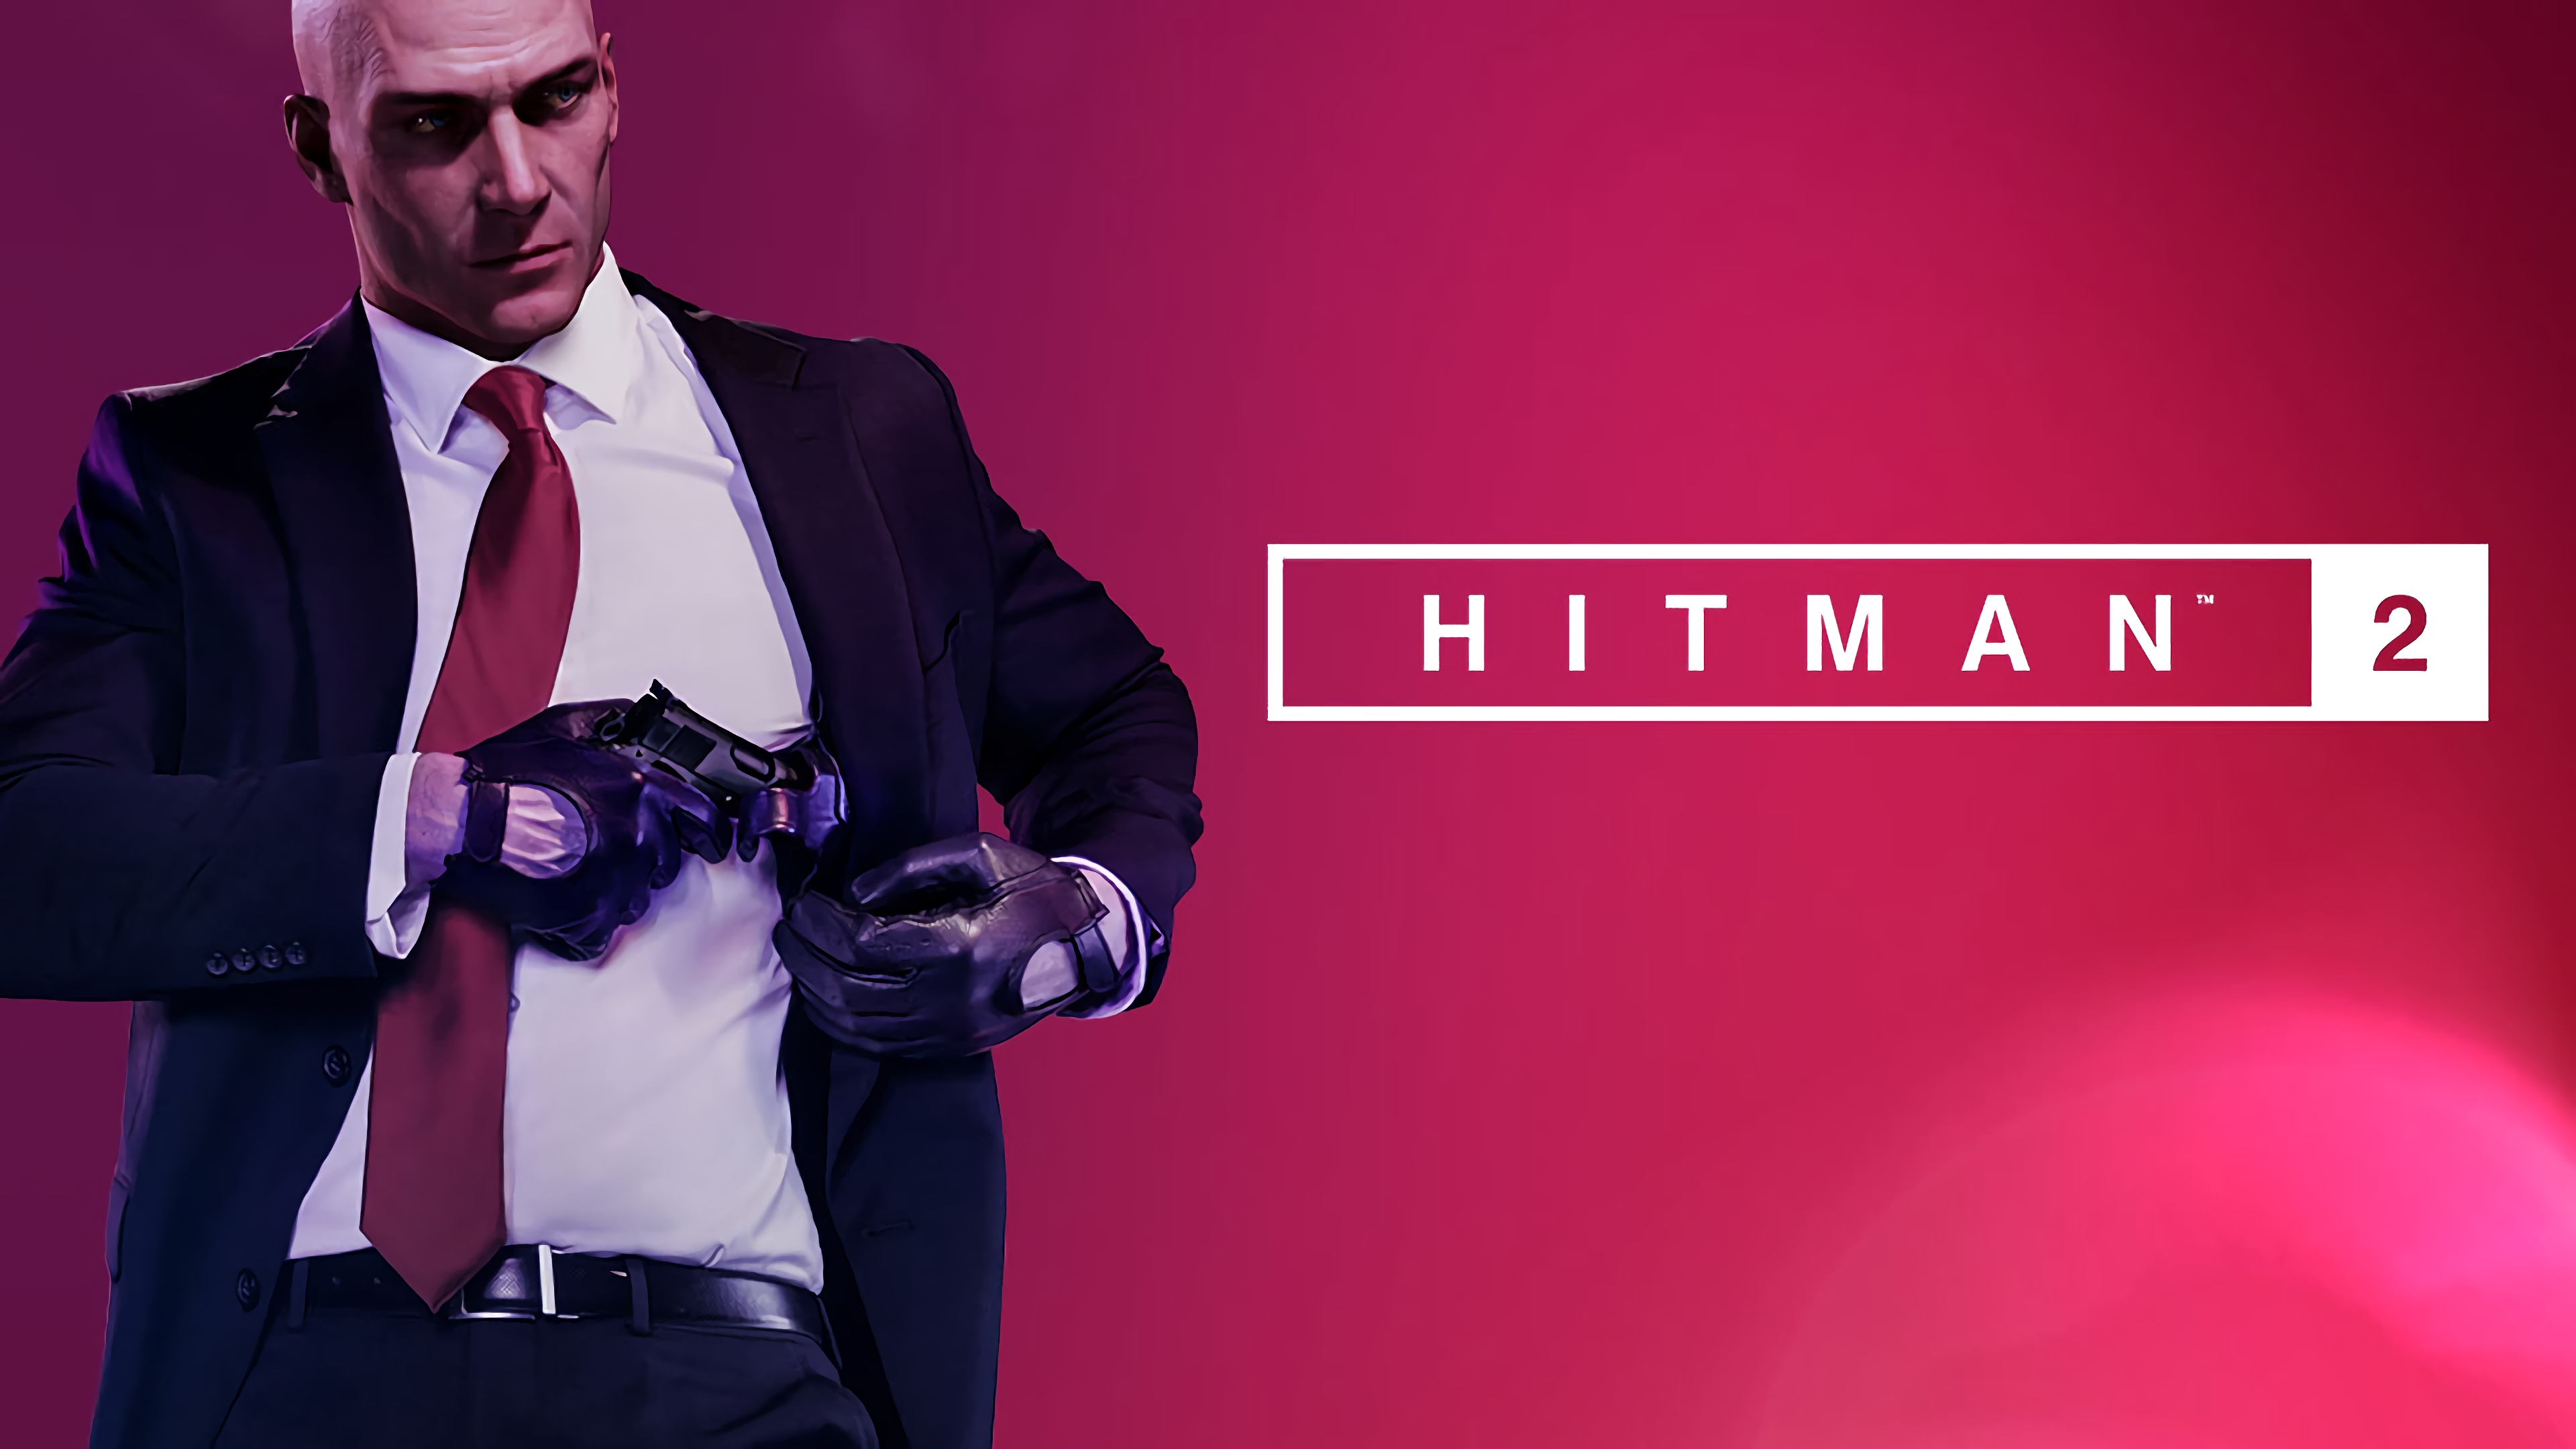 Hitman 2 Game Widescreen Wallpaper 67155 3840x2160px